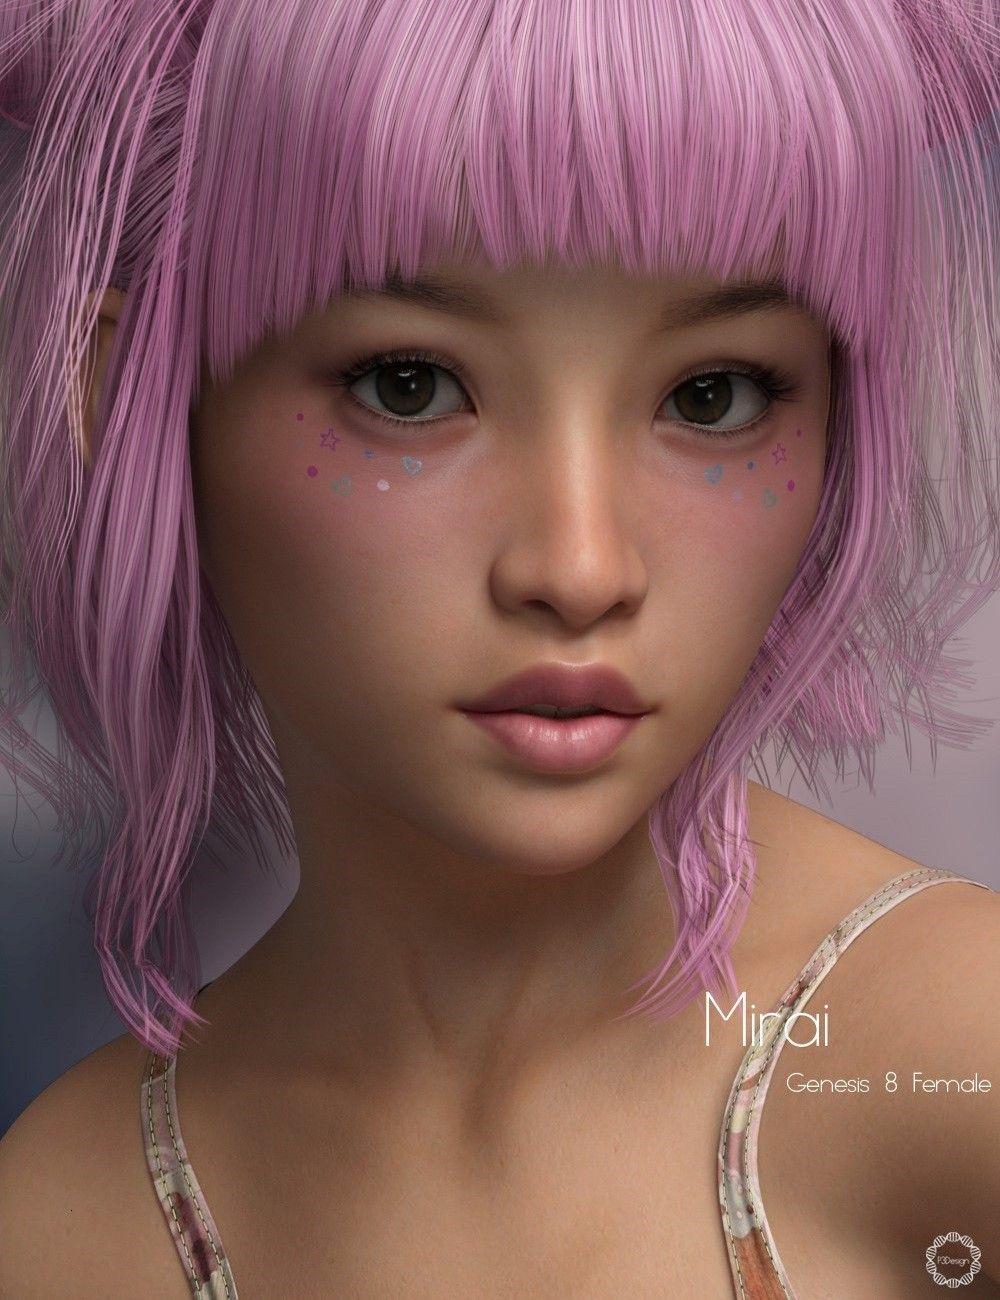 P3D Mirai for Genesis 8 Female | 3D Models and 3D Software